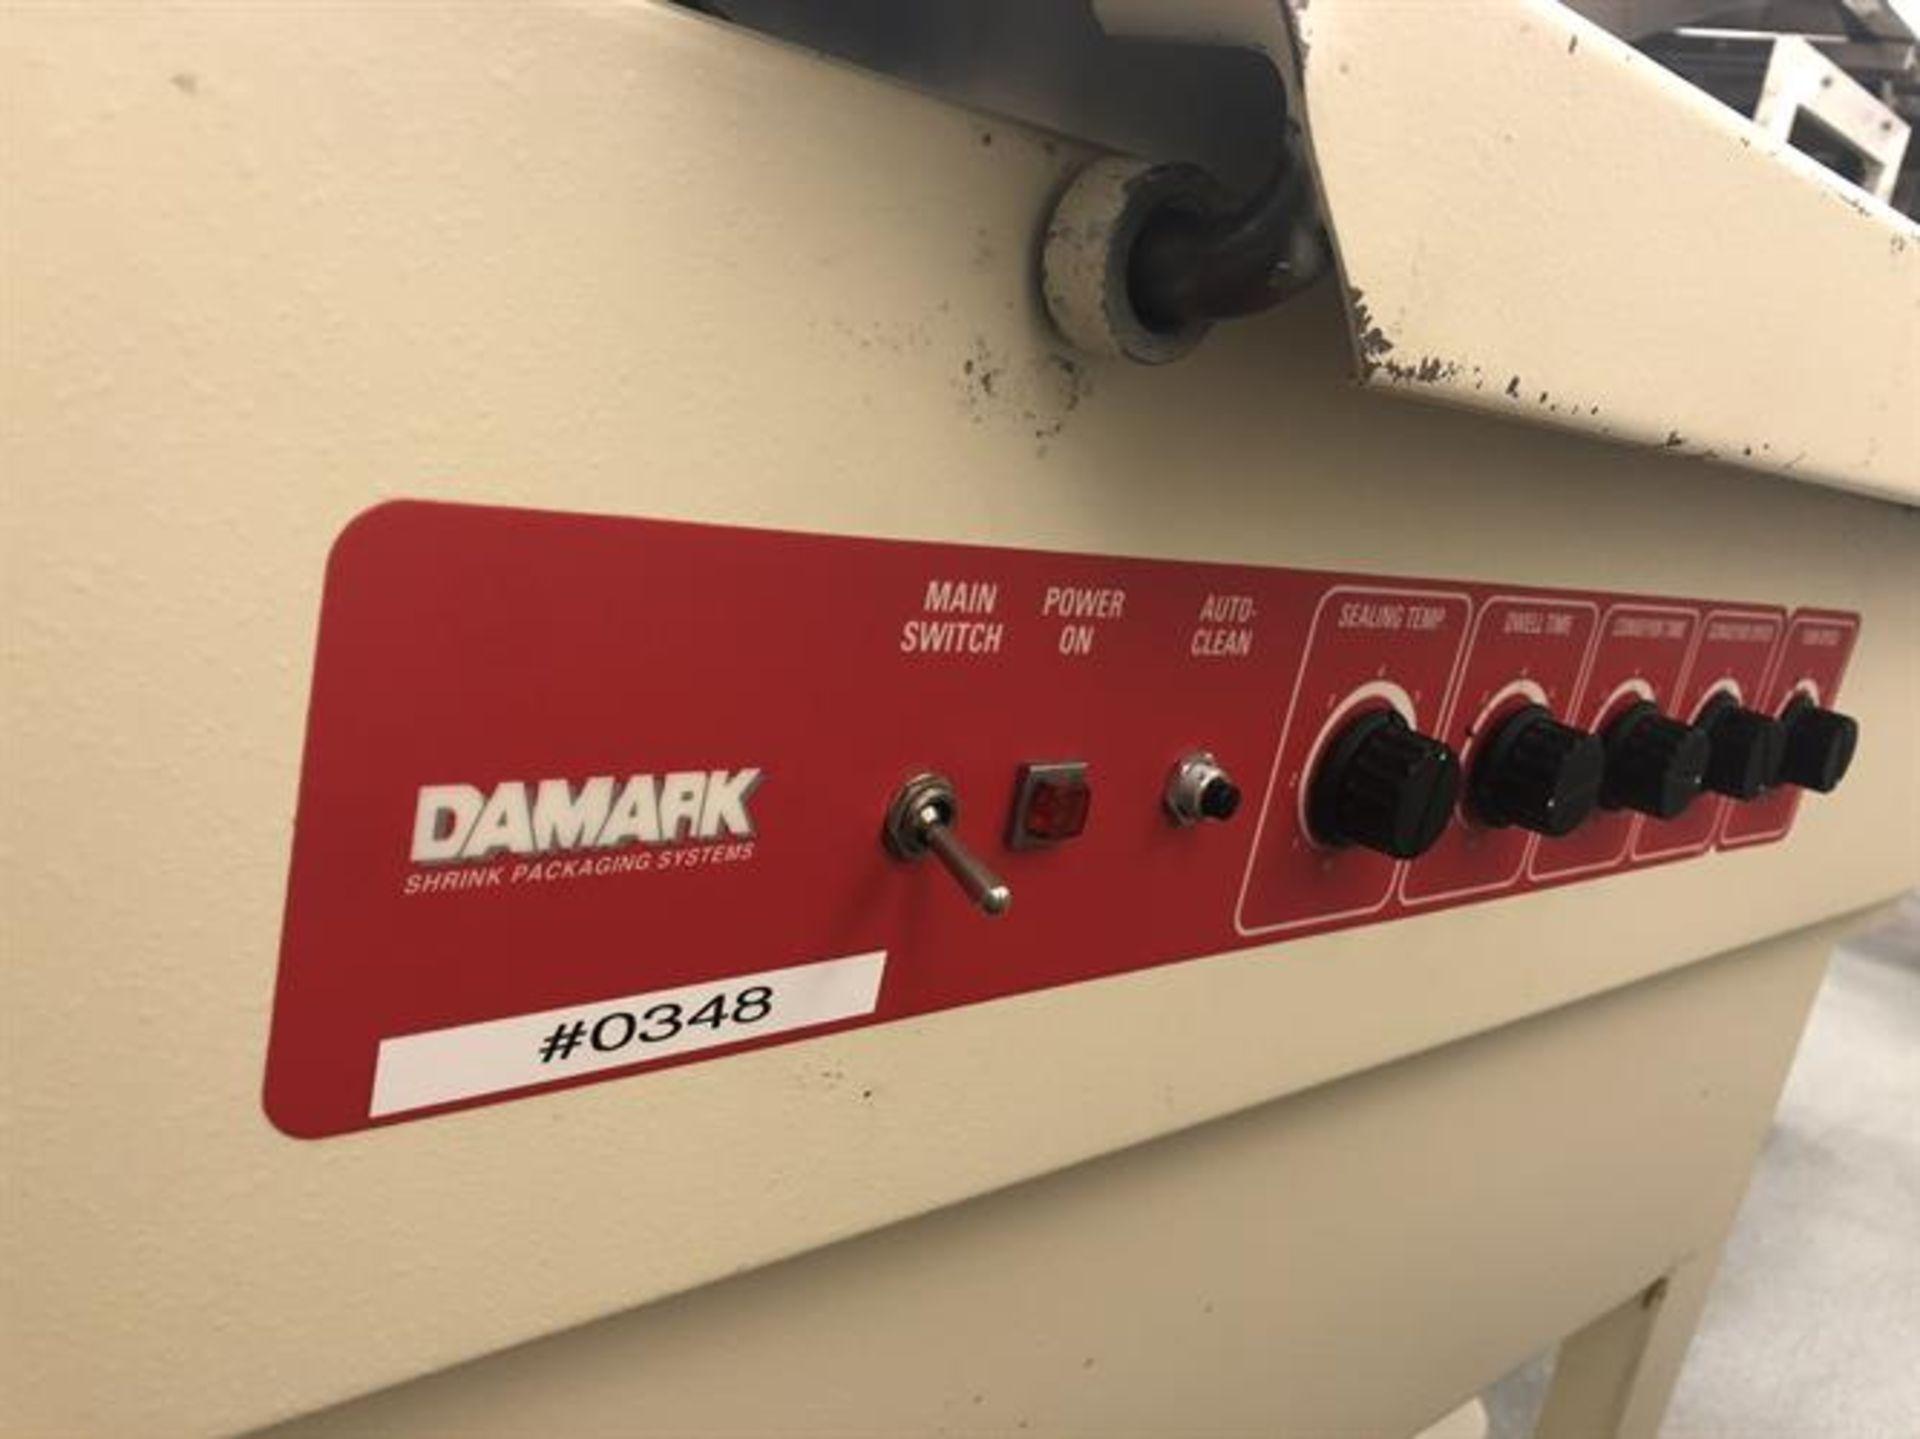 "Damark model SMC 2228 L-Bar Sealer - 22"" x 28"" sealing area - Timers and controls - Take away belt - Image 3 of 5"